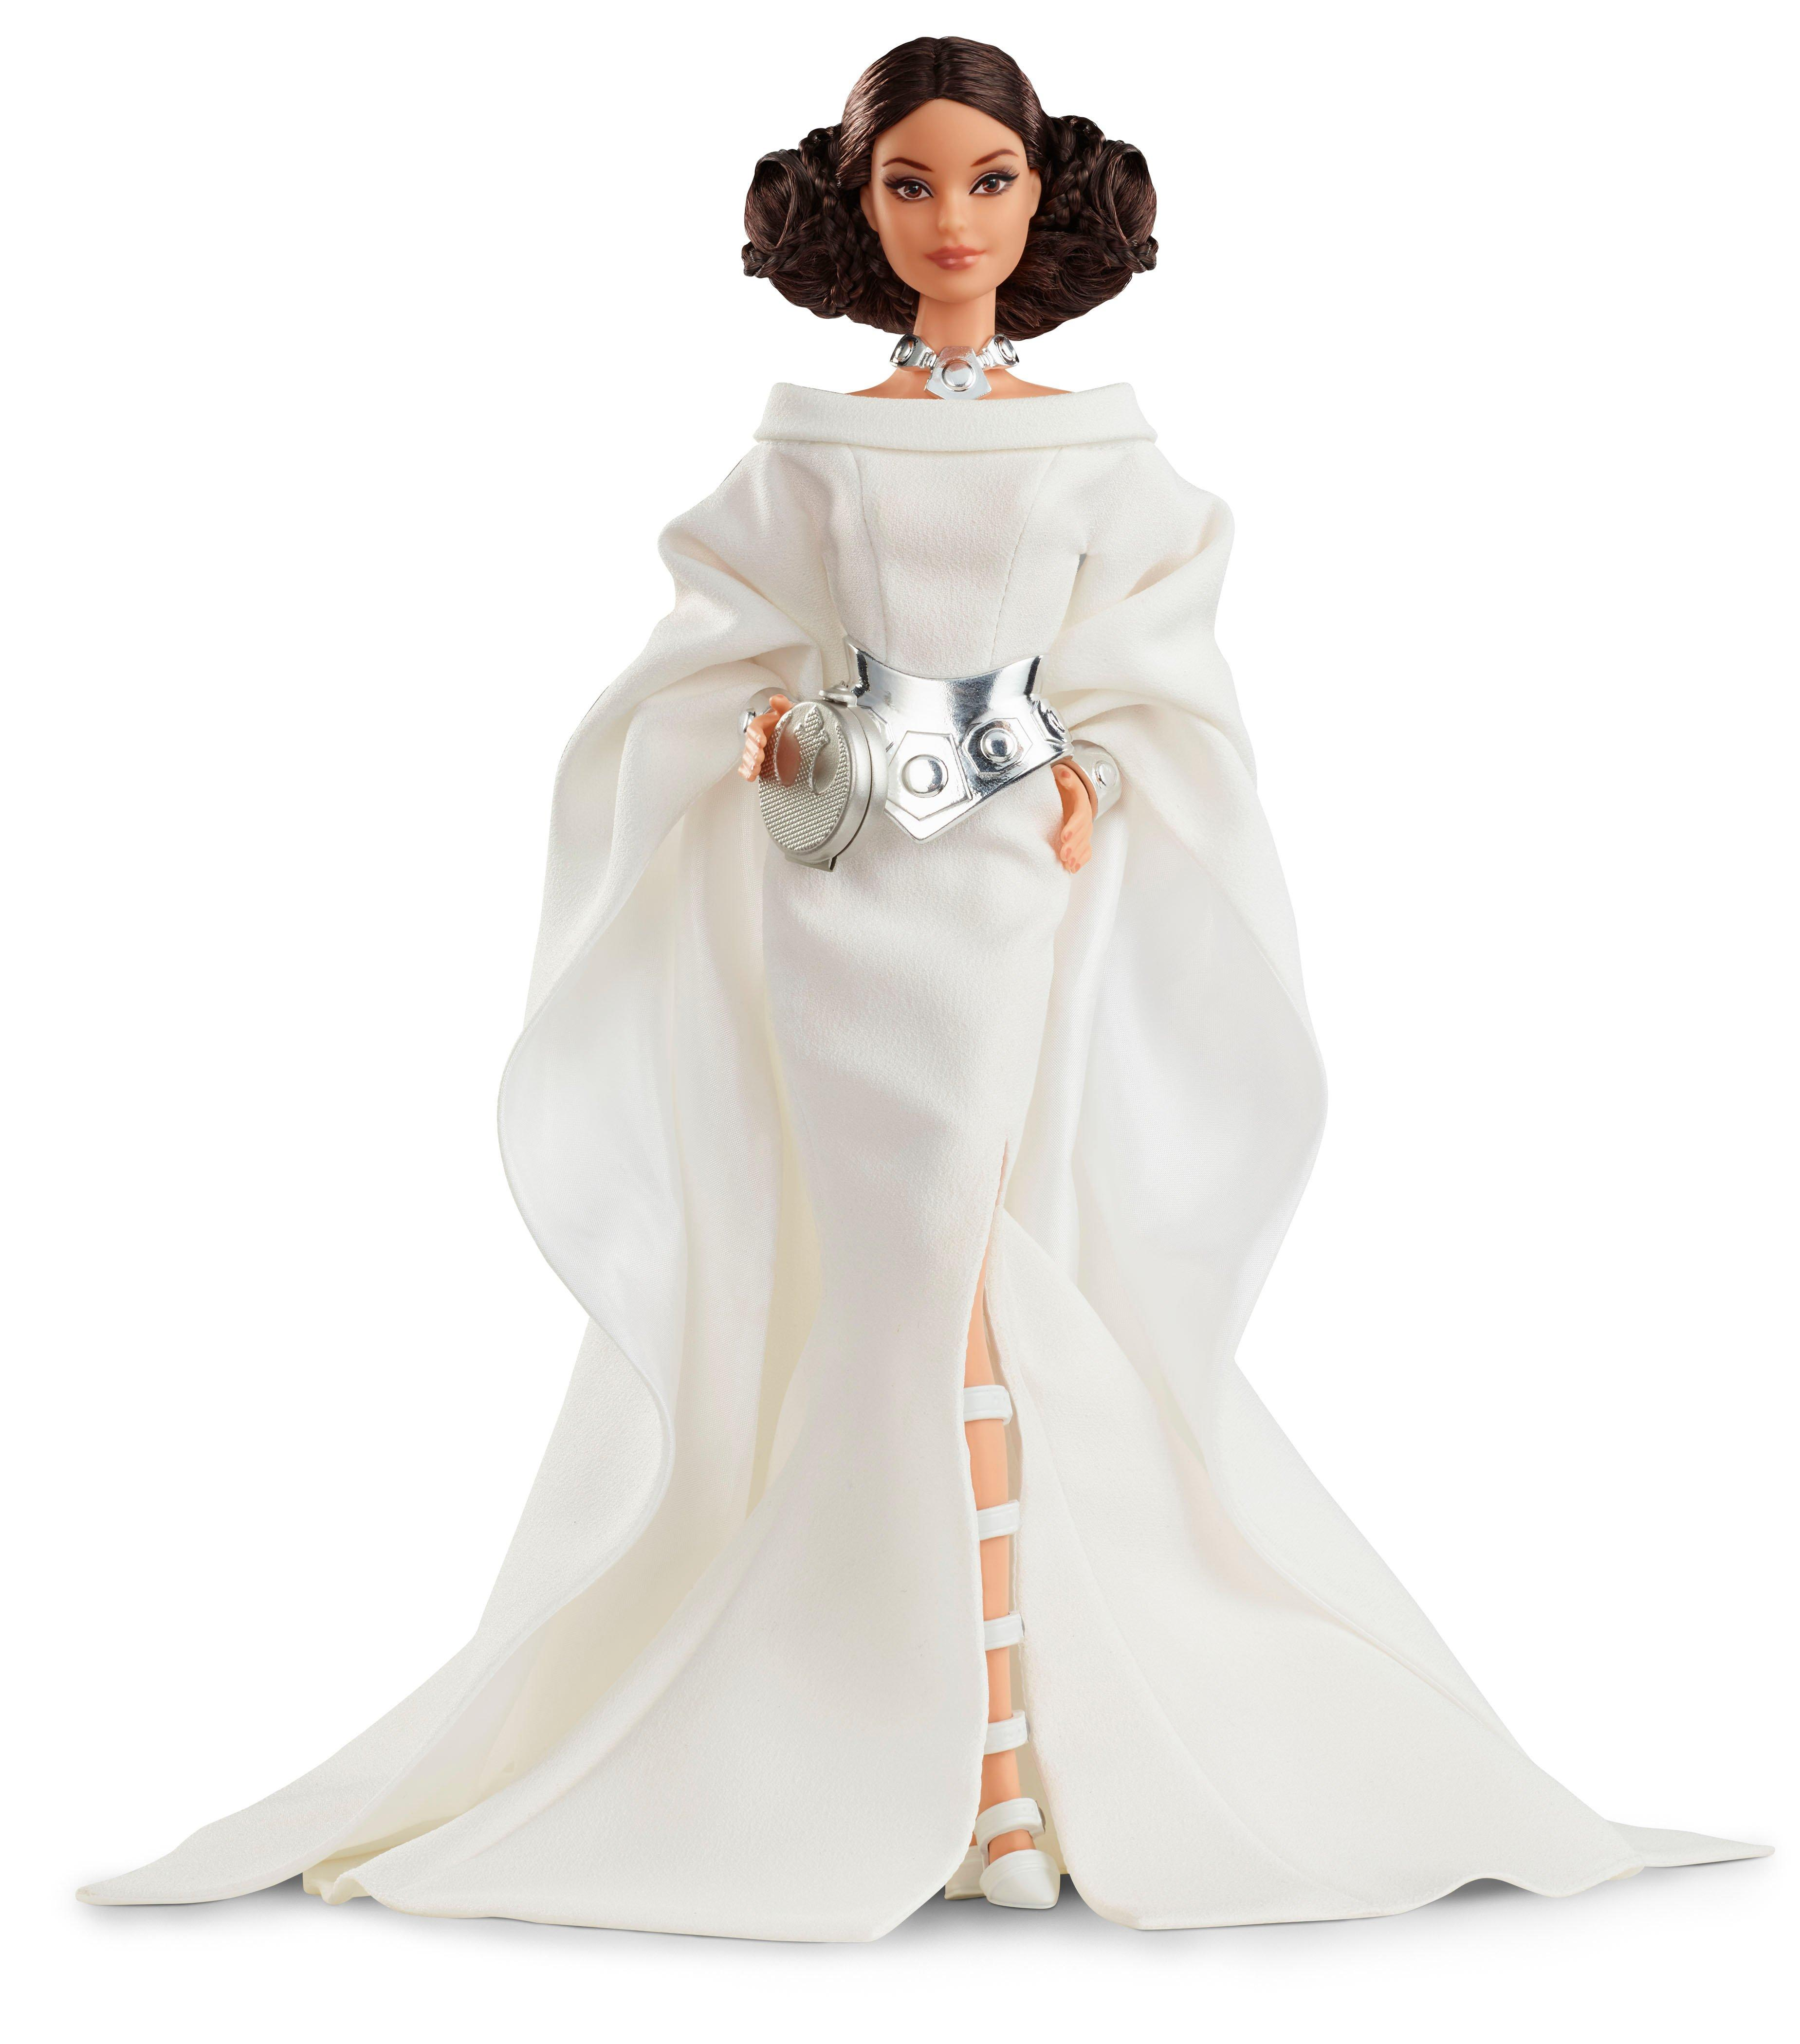 Star Wars A New Hope Princess Leia Barbie Signature Doll